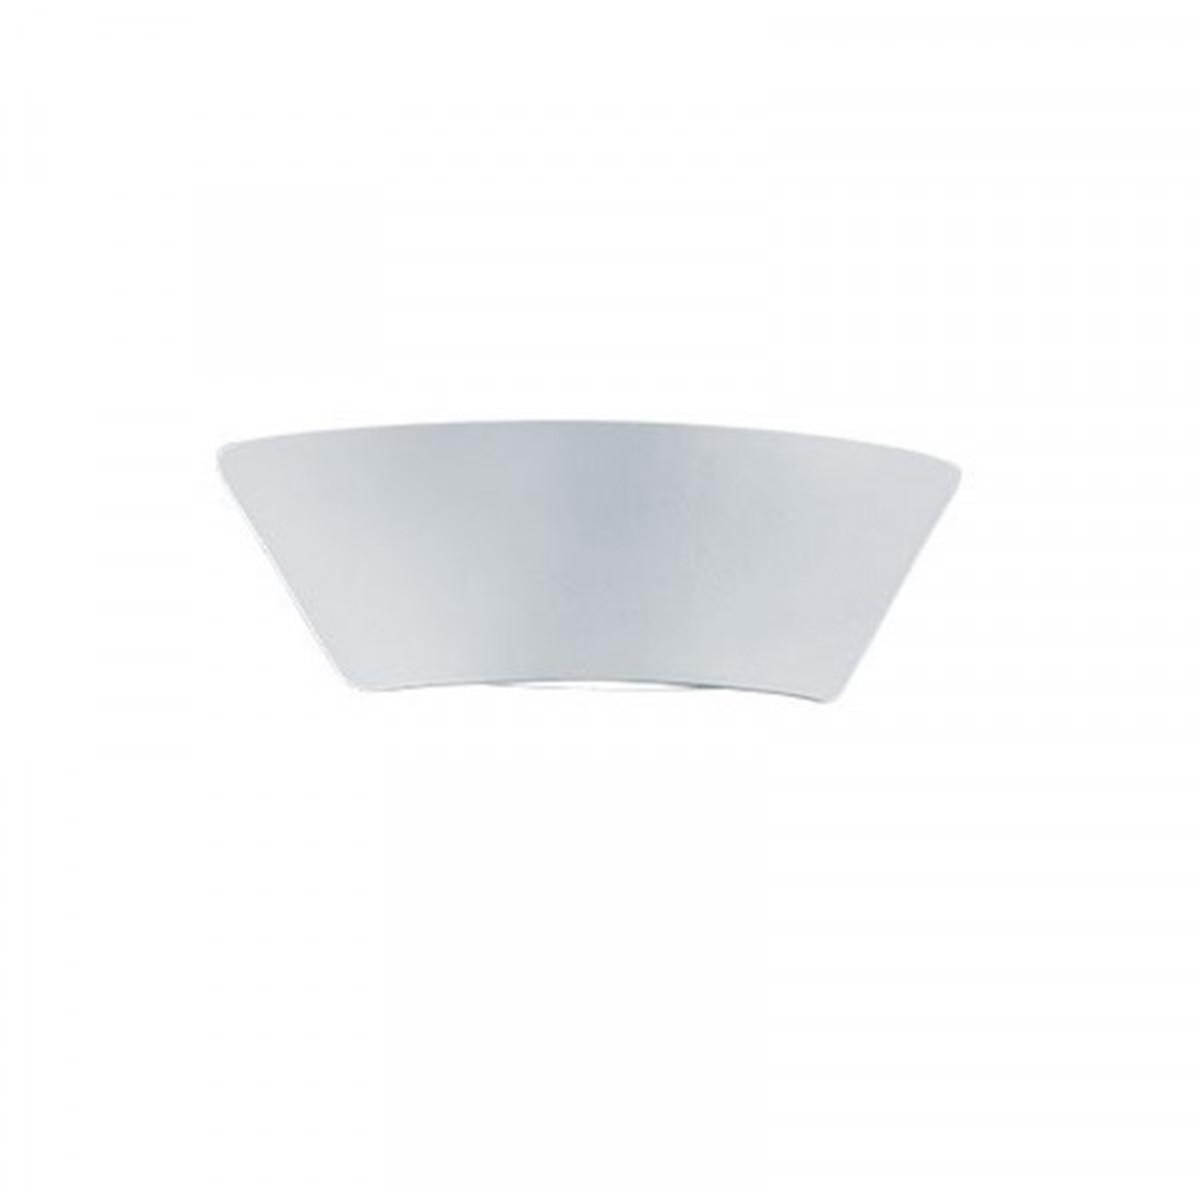 LED Tuinverlichting - Tuinlamp - Trion Sacamon - Wand - 7W - Mat Wit - Aluminium